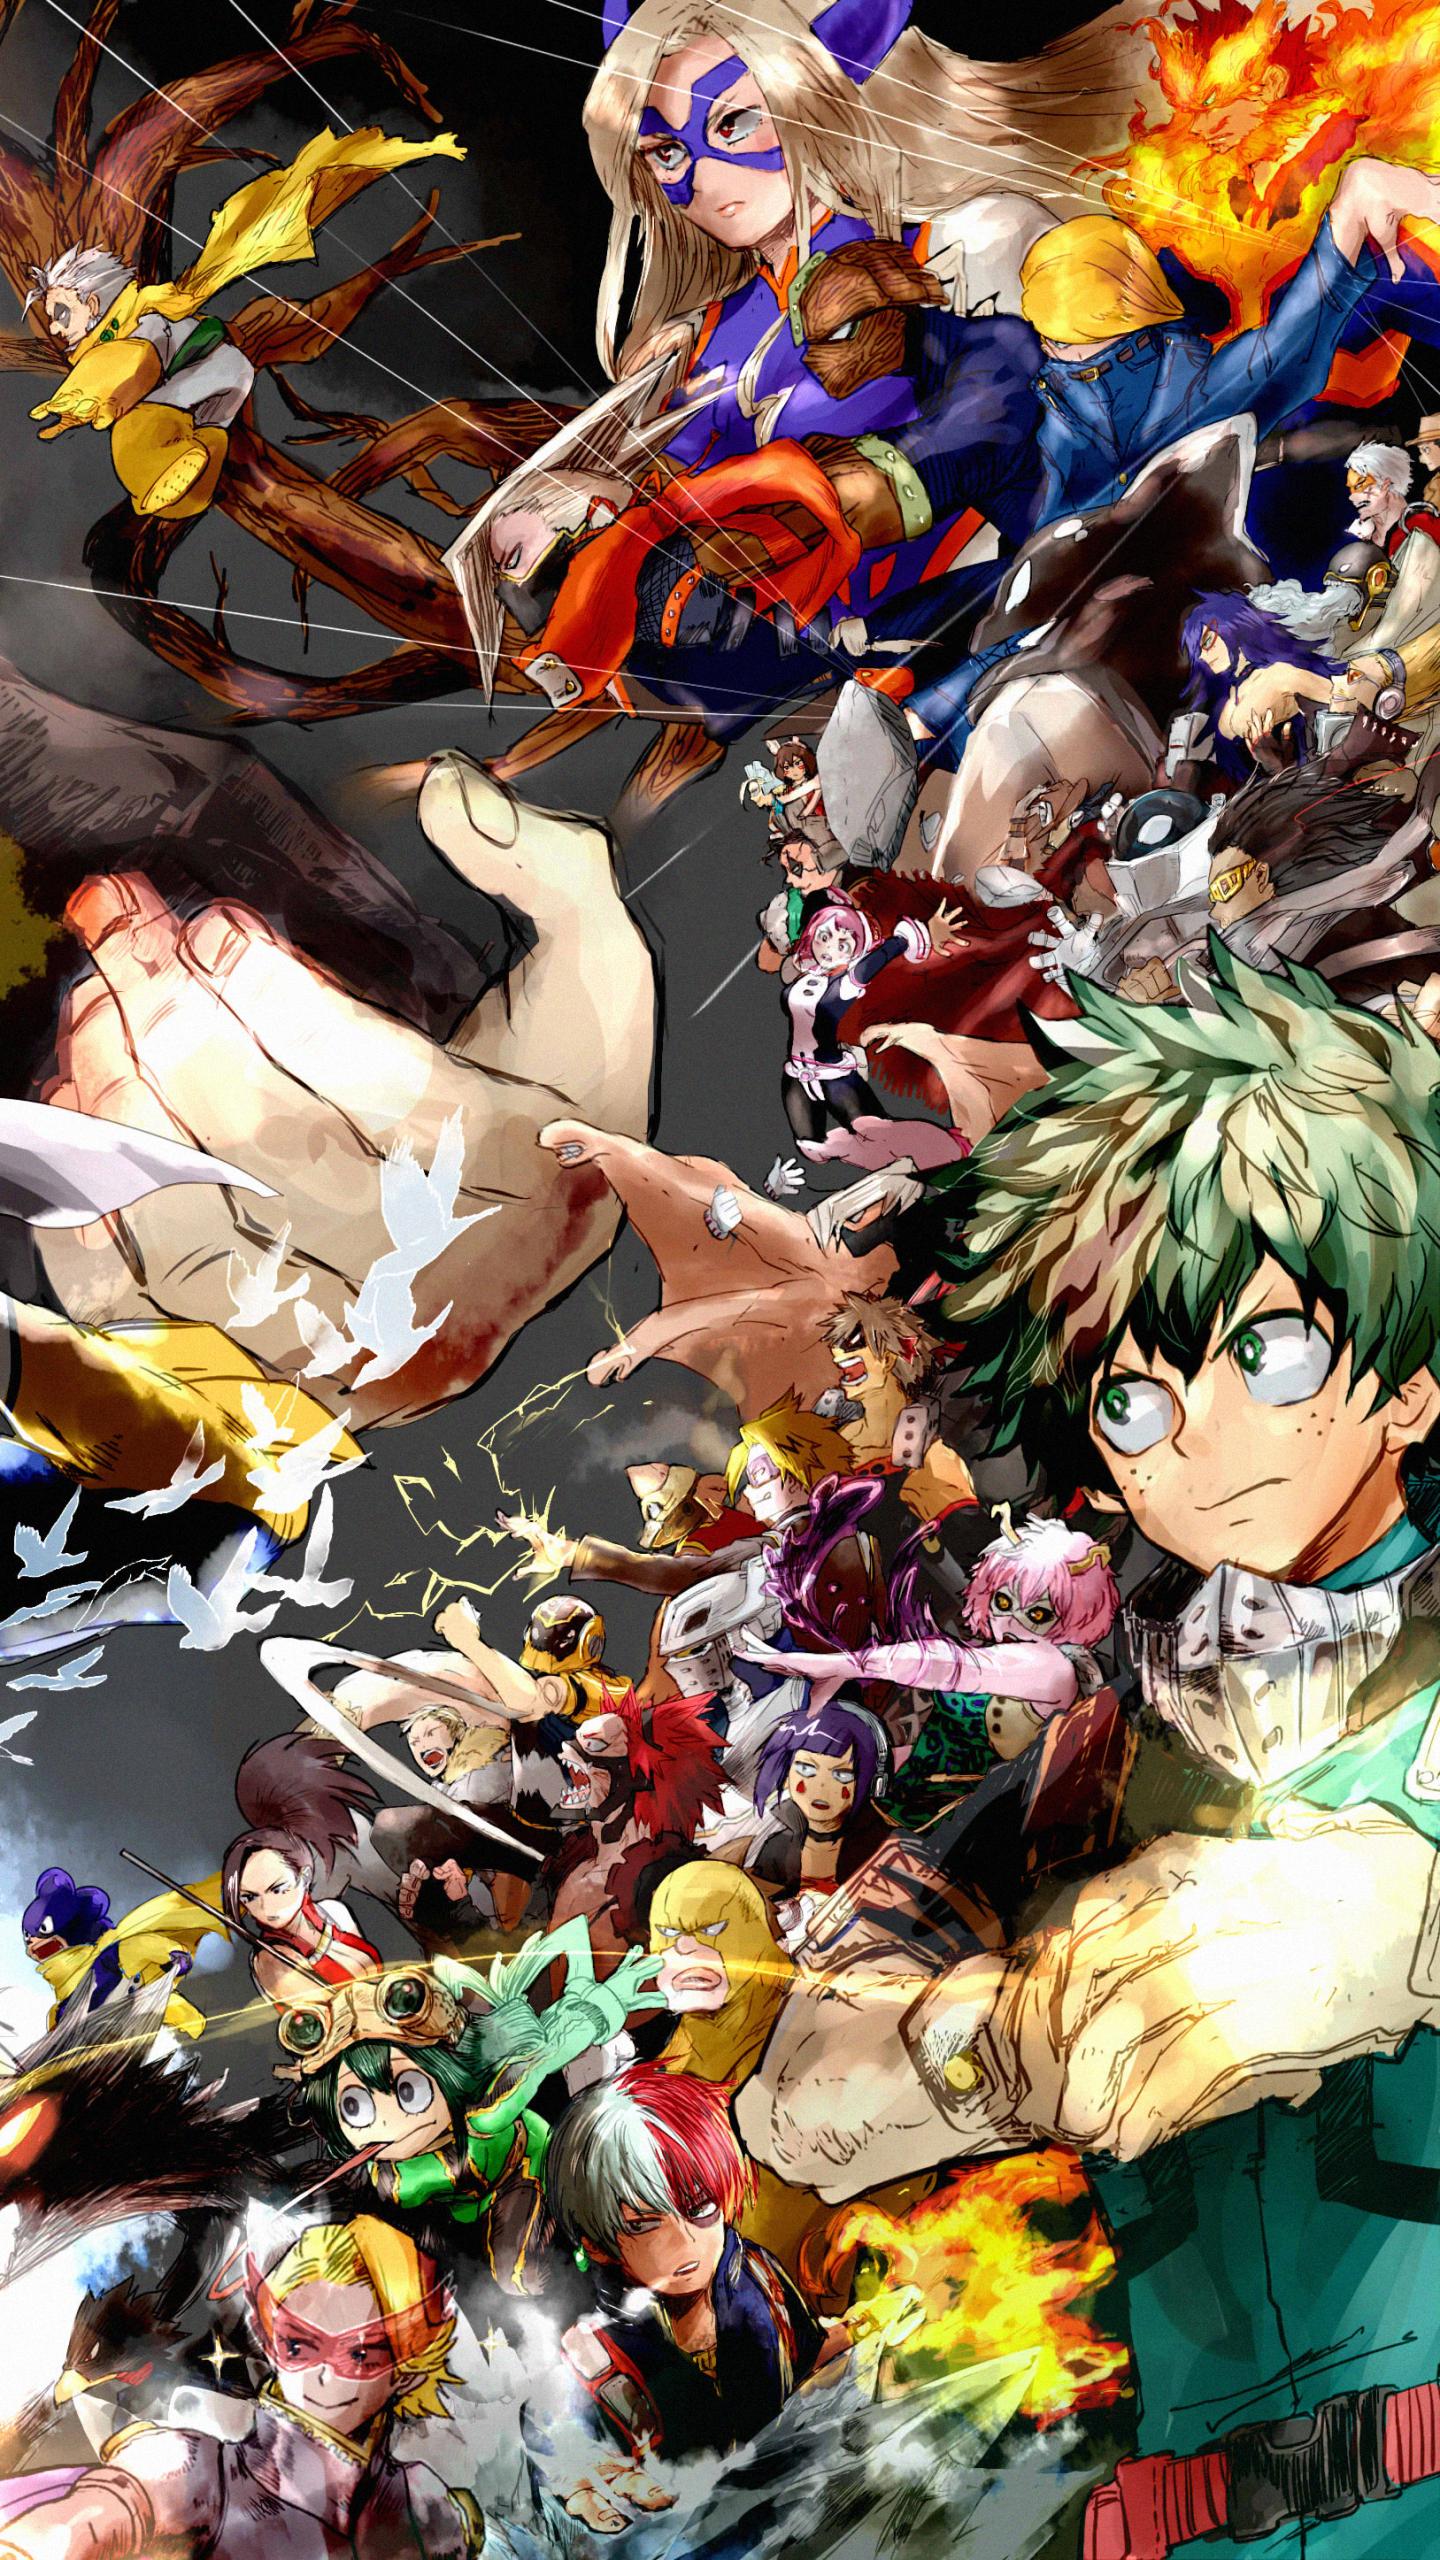 Pin By Courtney Masterson On 7 Plus Anime Wallpaper Hero Wallpaper My Hero Academia Episodes